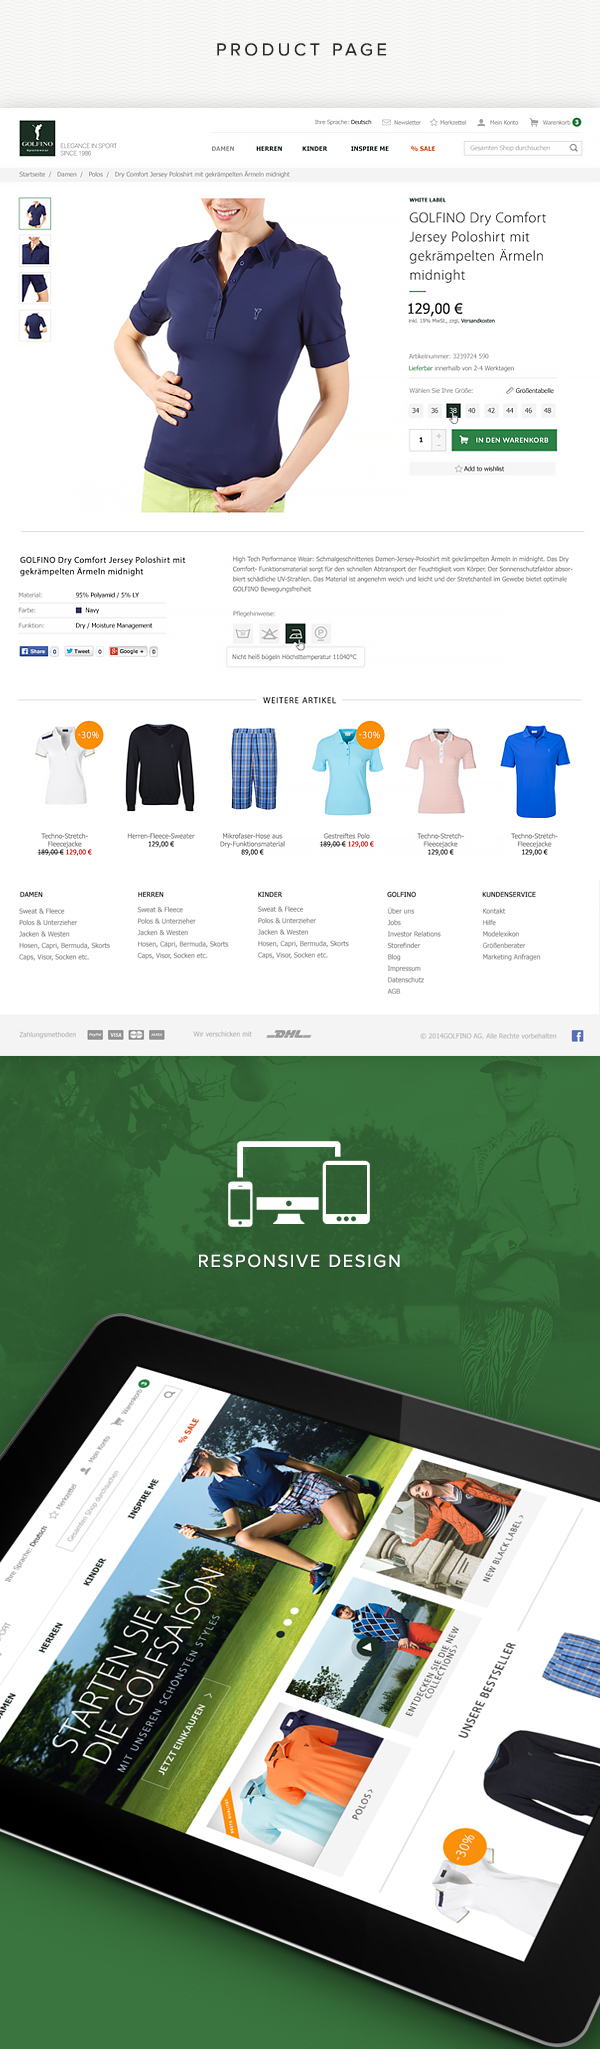 Golfino,Sportswear,golf,sport,Clothing,store,elegance,clean,online,e-commerce,shop,magento